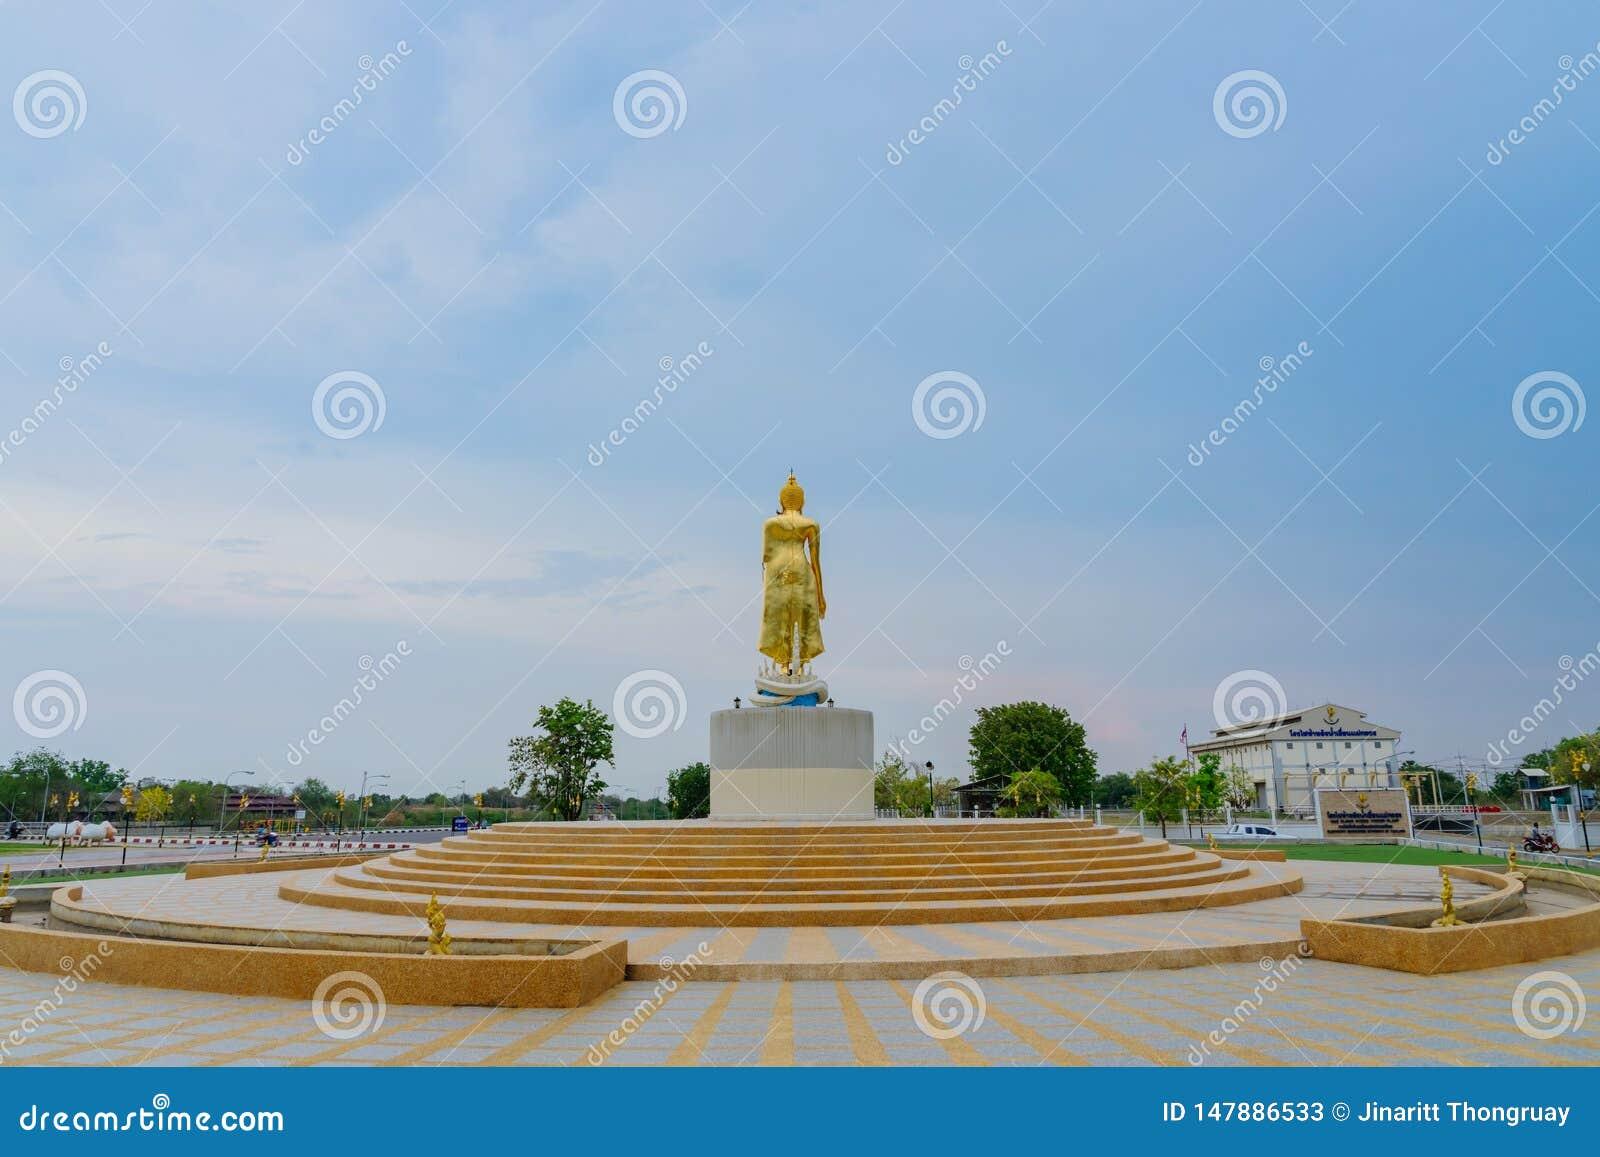 KANCHANABURI ΤΑΪΛΑΝΔΗ - 5 ΑΠΡΙΛΊΟΥ: Αγάλματα του χρυσά Βούδα που βρίσκονται στο φράγμα τον Απρίλιο 5,2019 της Mae Klong